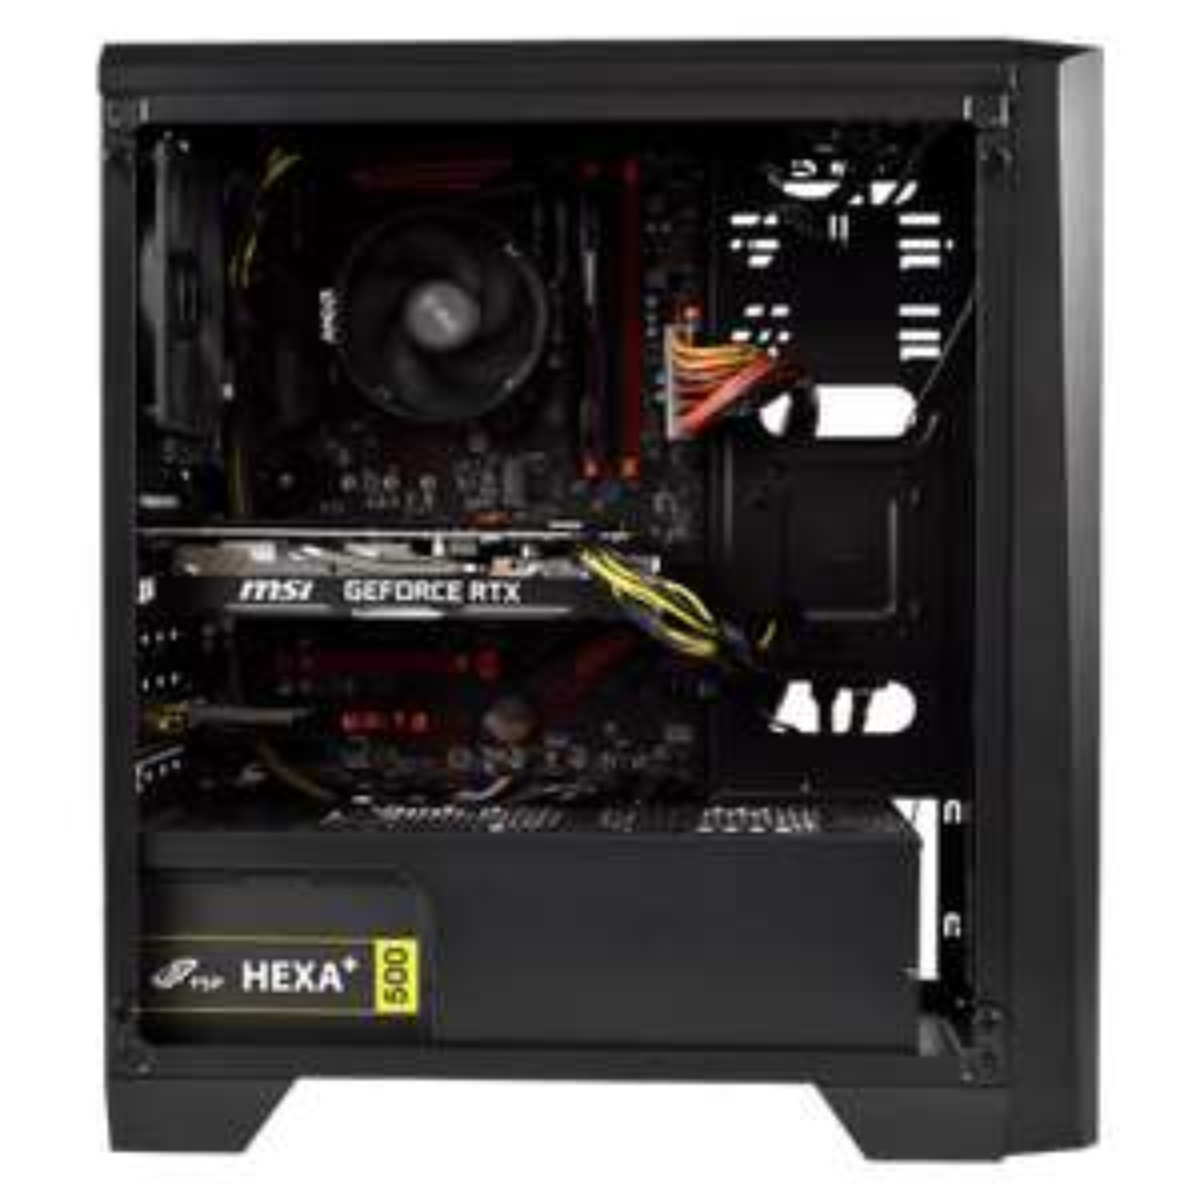 PC de Bureau Cybertek Covenant - Ryzen 5 3600, 16 Go RAM 3000Mhz, SSD 480 Go, RTX 2070 Super